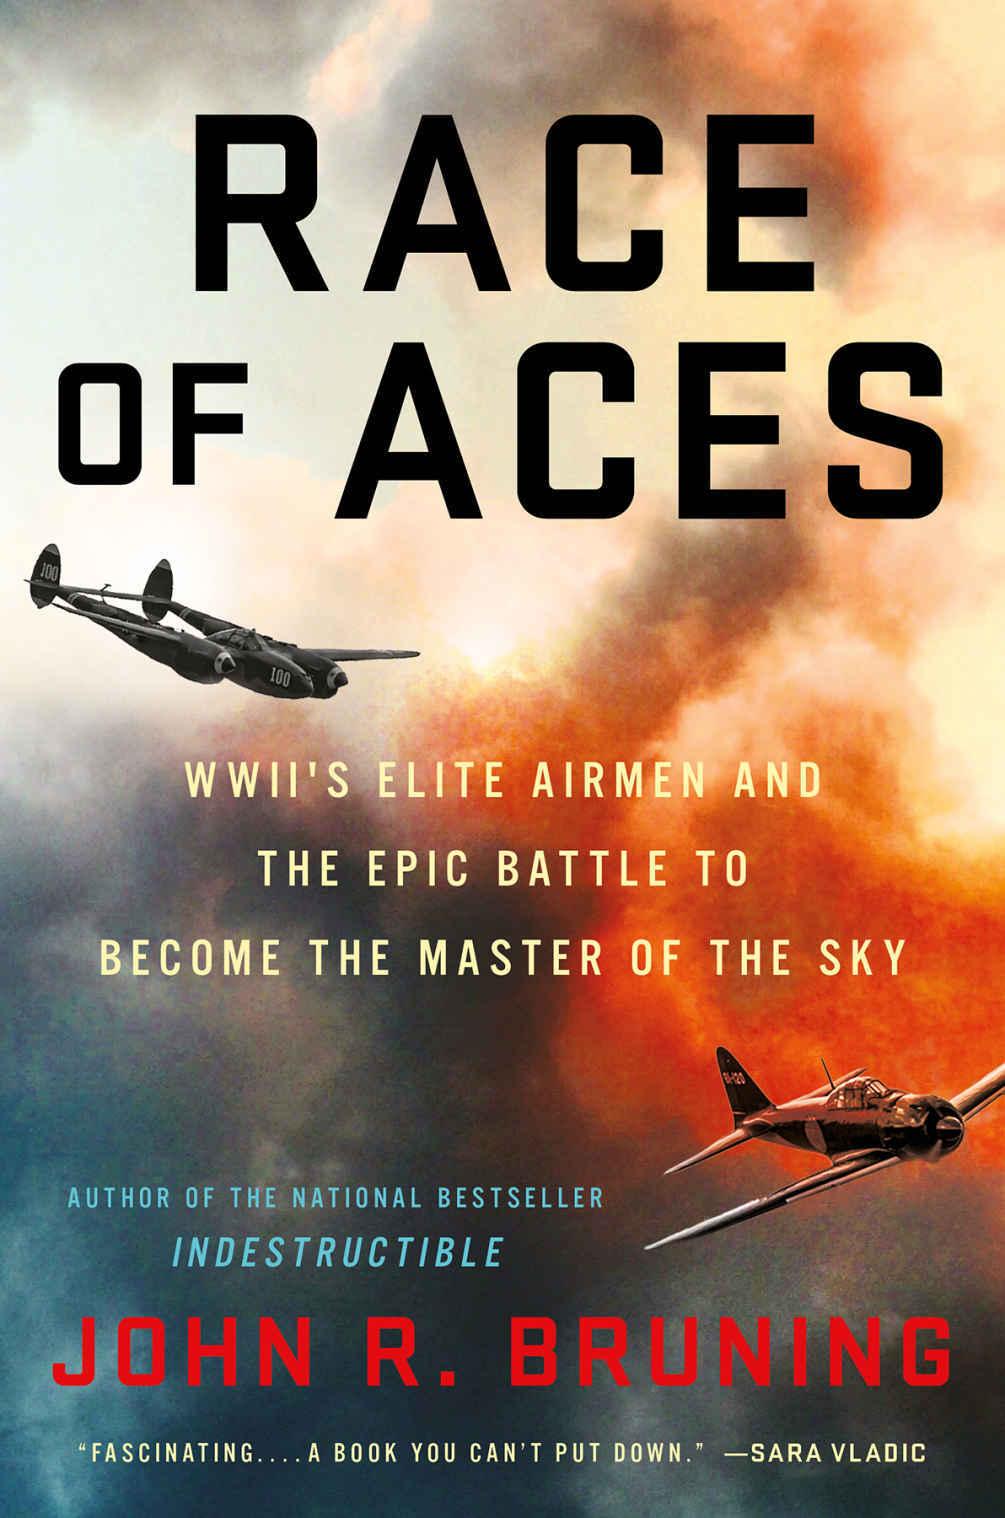 Race of Aces.jpg